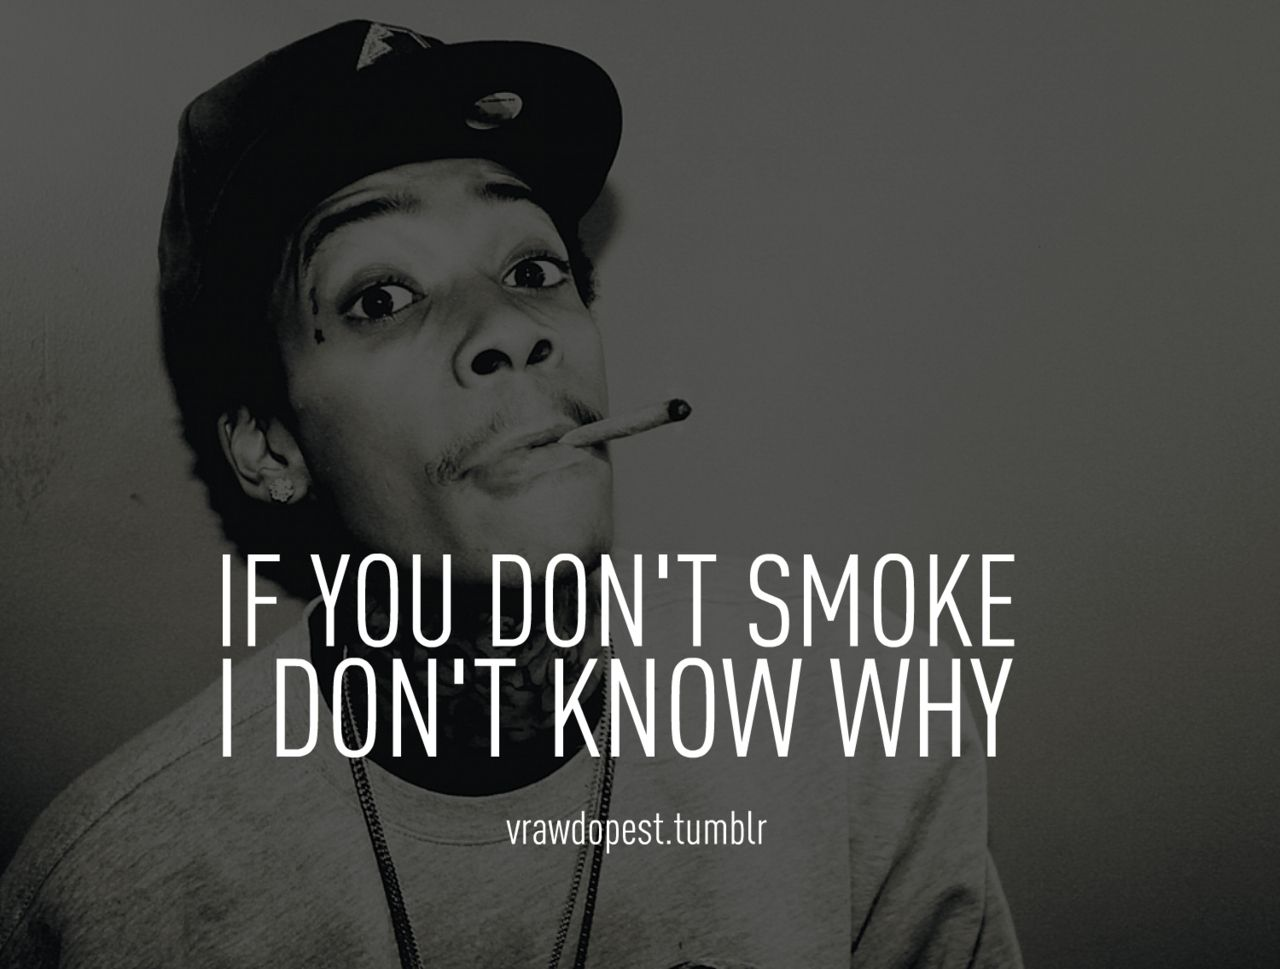 Wiz Khalifa Quotes Tumblr 2012 Wiz Khalifa Quotes Hd Wallpaper 3